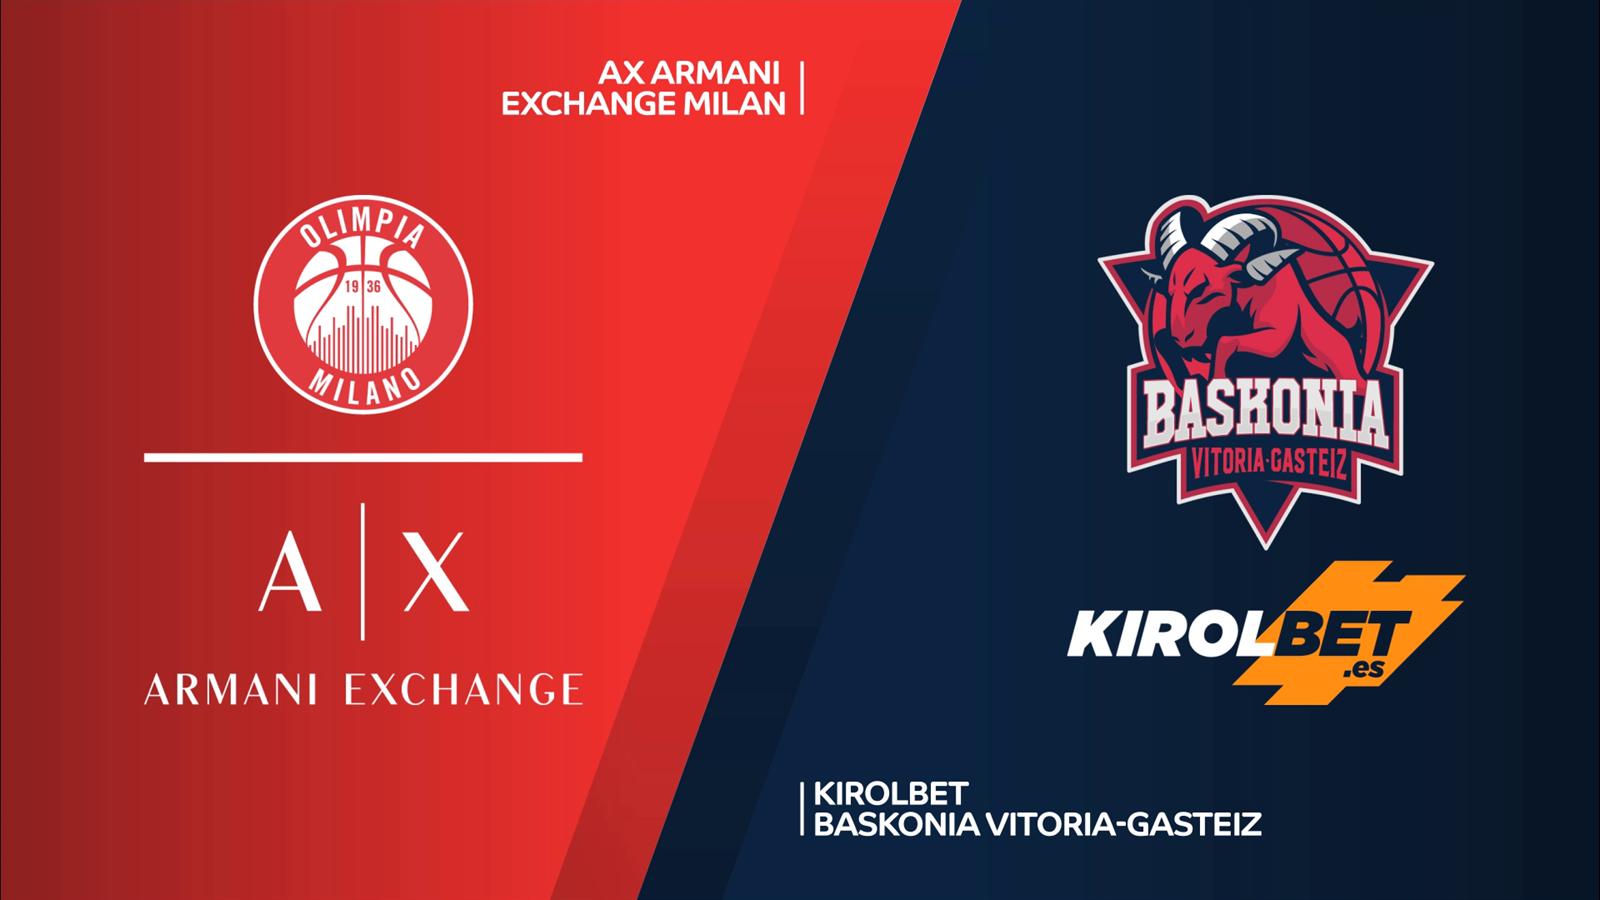 VIDEO - Highlights: AX Armani Exchange Milano-Kirolbet Baskonia 81-74 - Eurolega - Eurosport.it